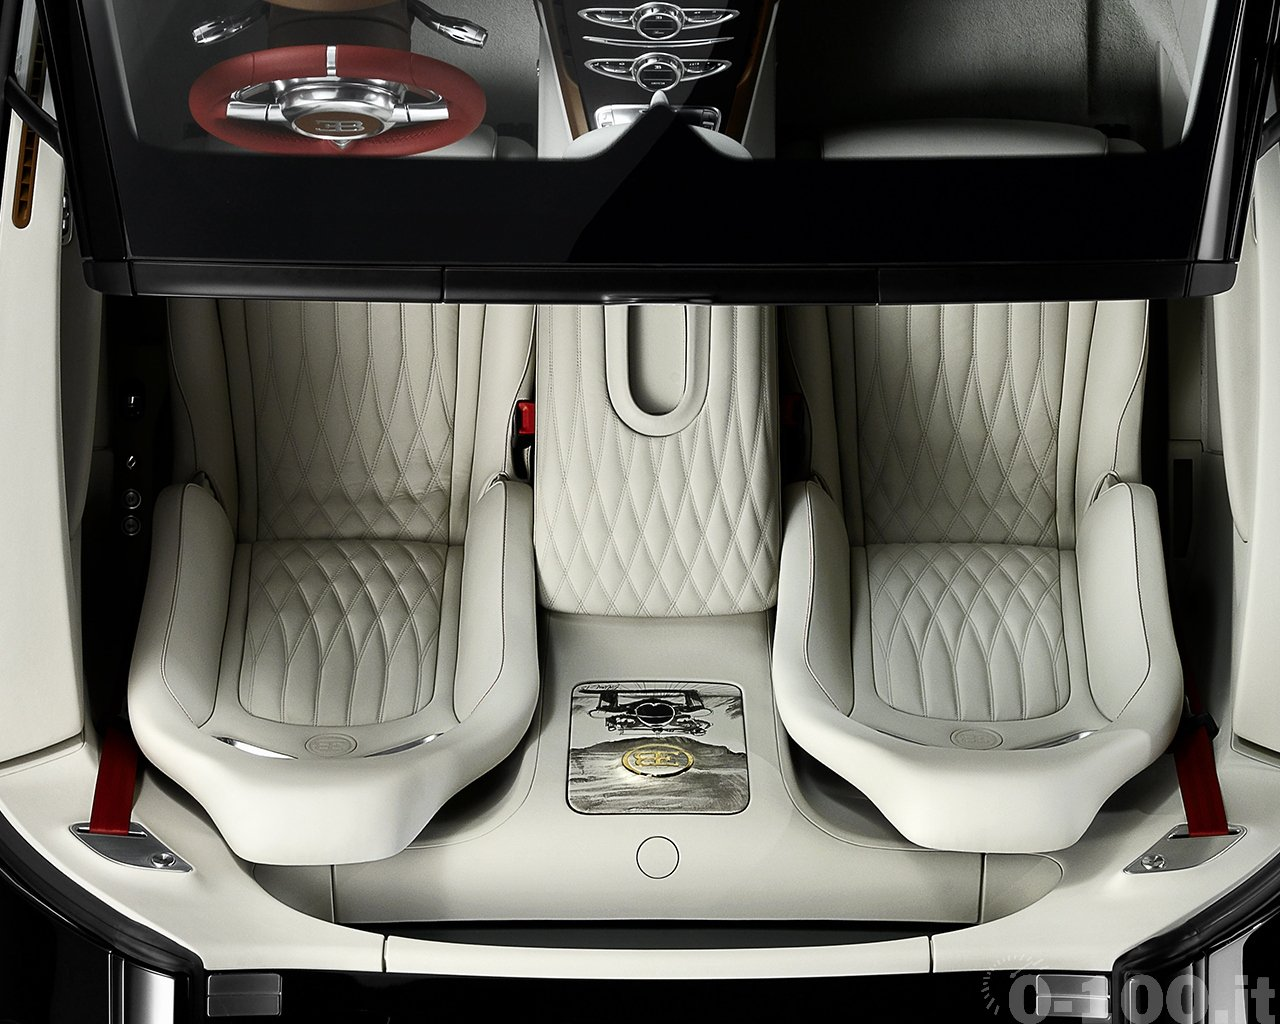 beijing-2014-bugatti-veyron-serie-speciale-les-legendes-de-bugatti-veyron-16-4-grand-sport-vitesse-black-bess_24